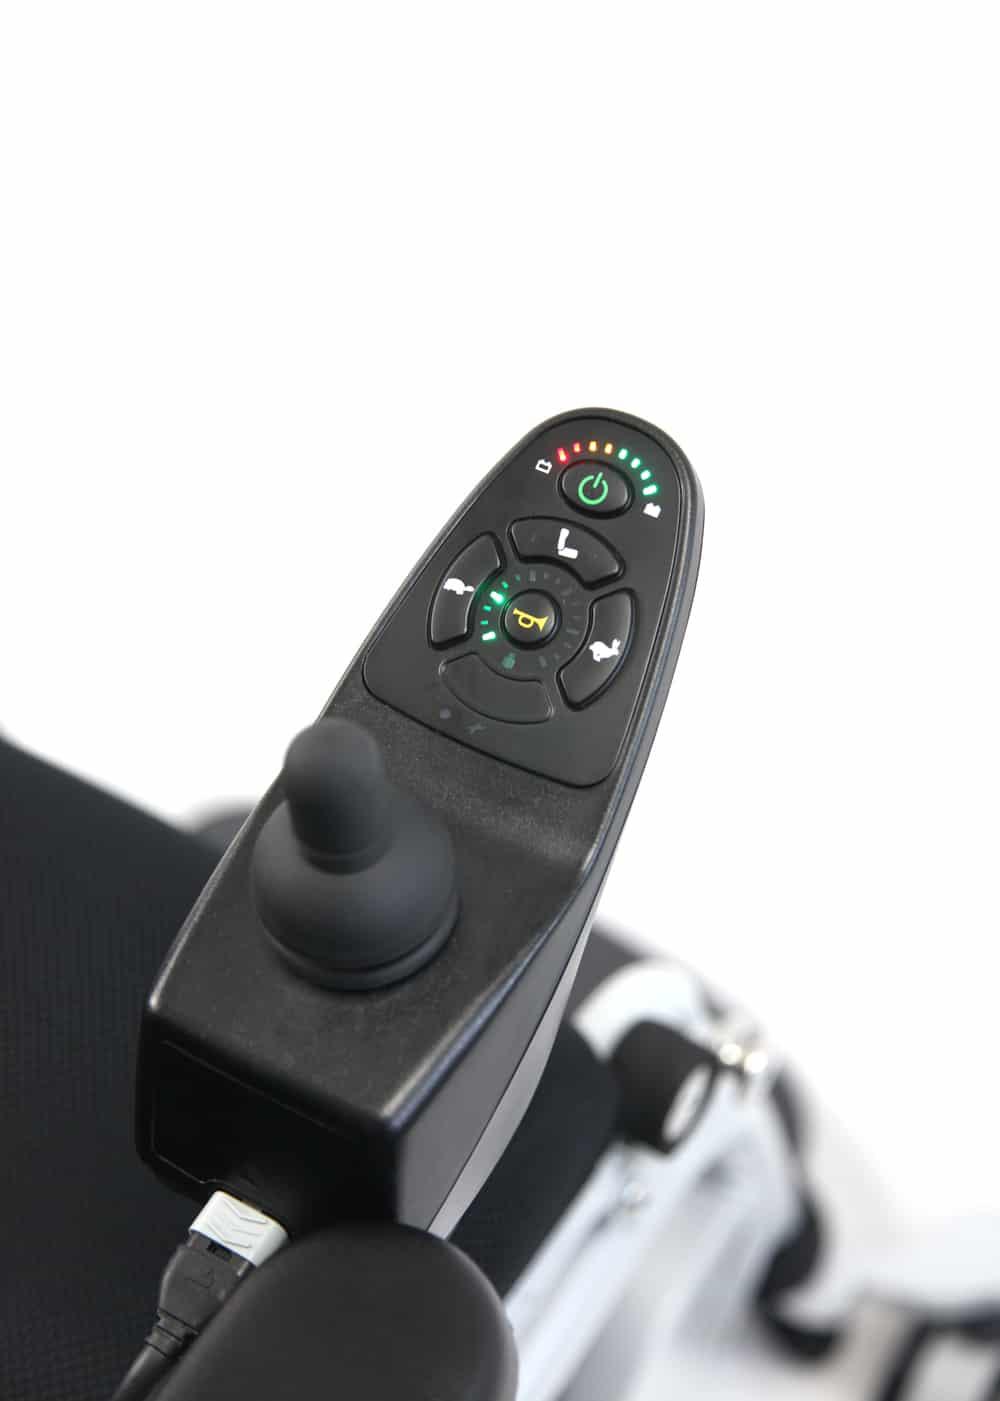 xo-202-joystick-view